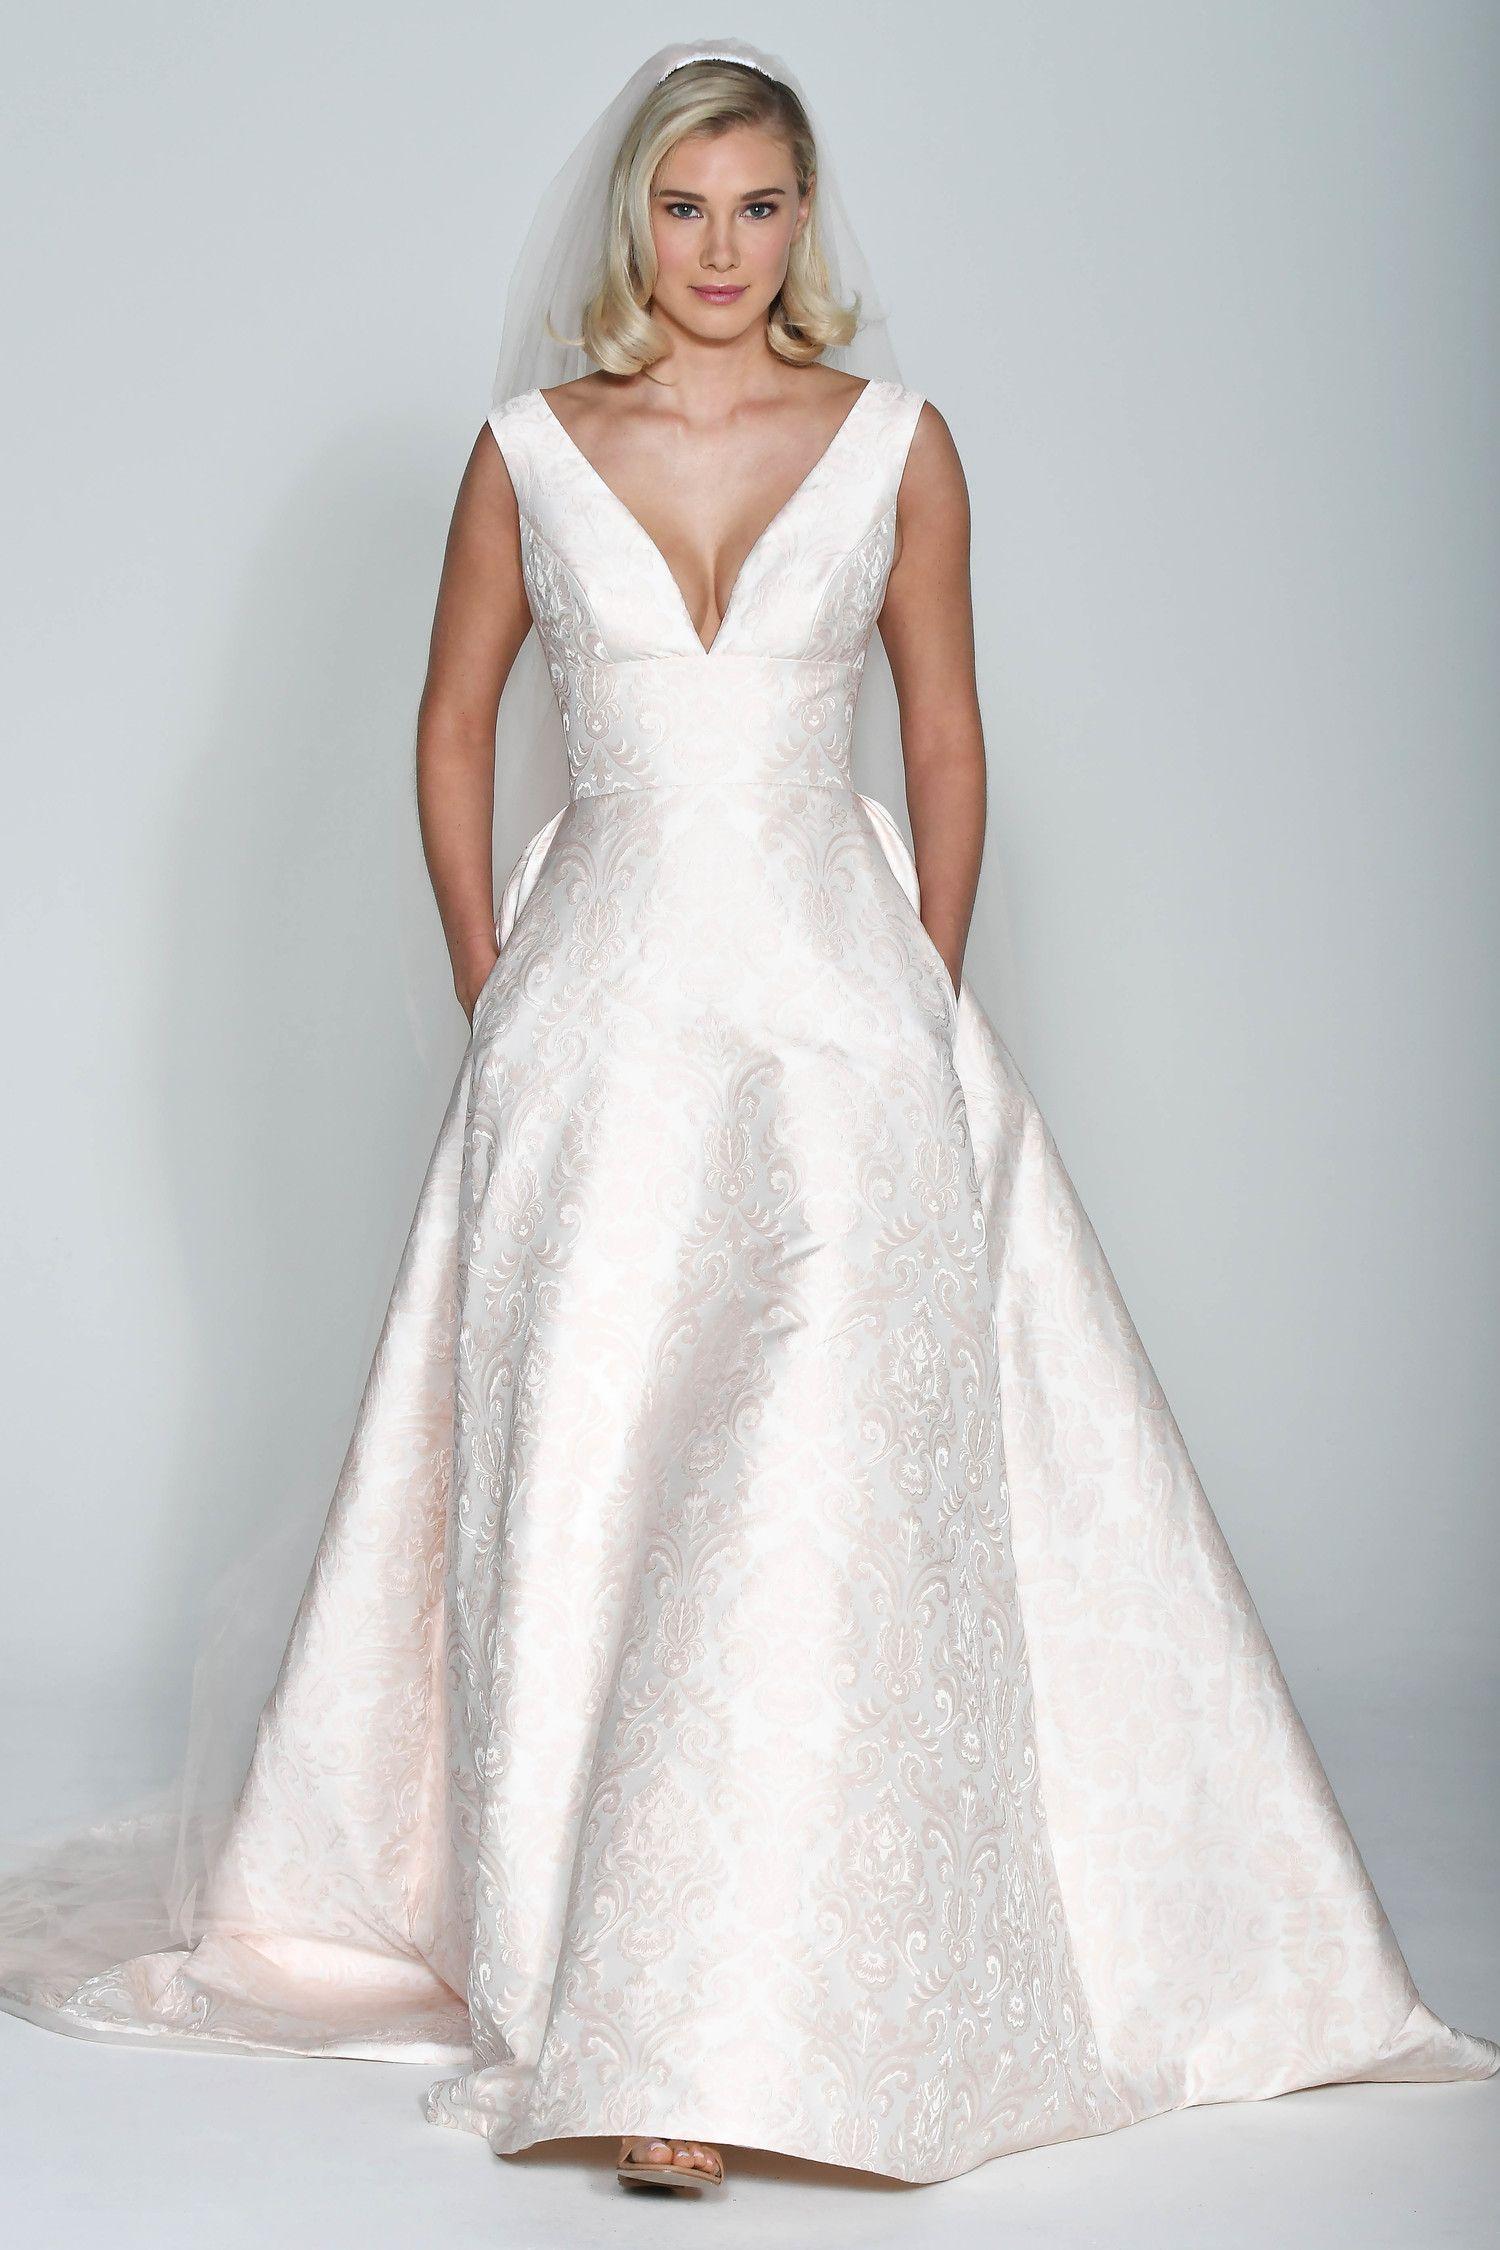 Satin Wedding Dress Fall 2018